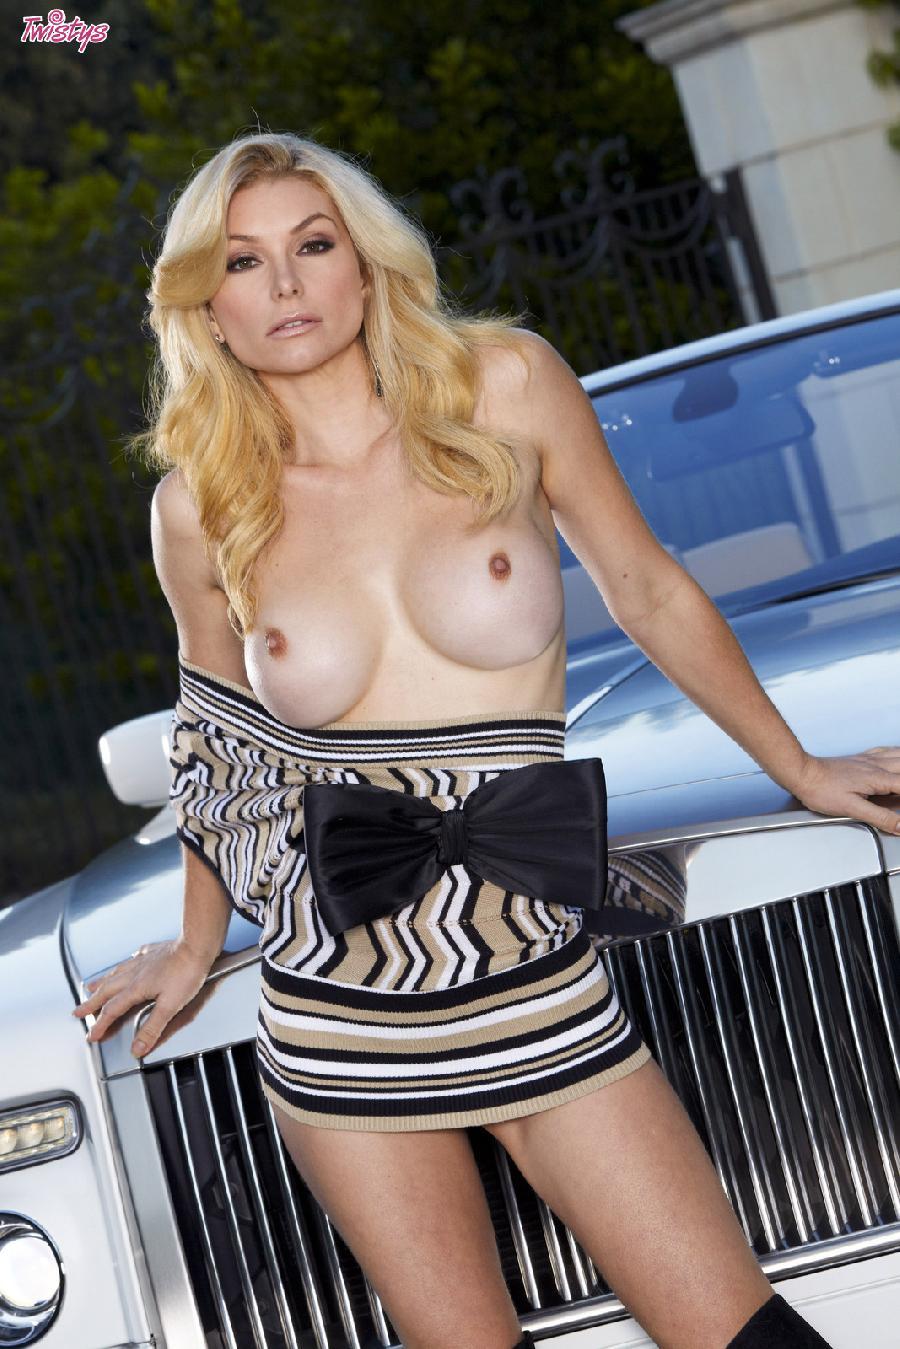 Heather Vandeven wanna catch a ride - 3